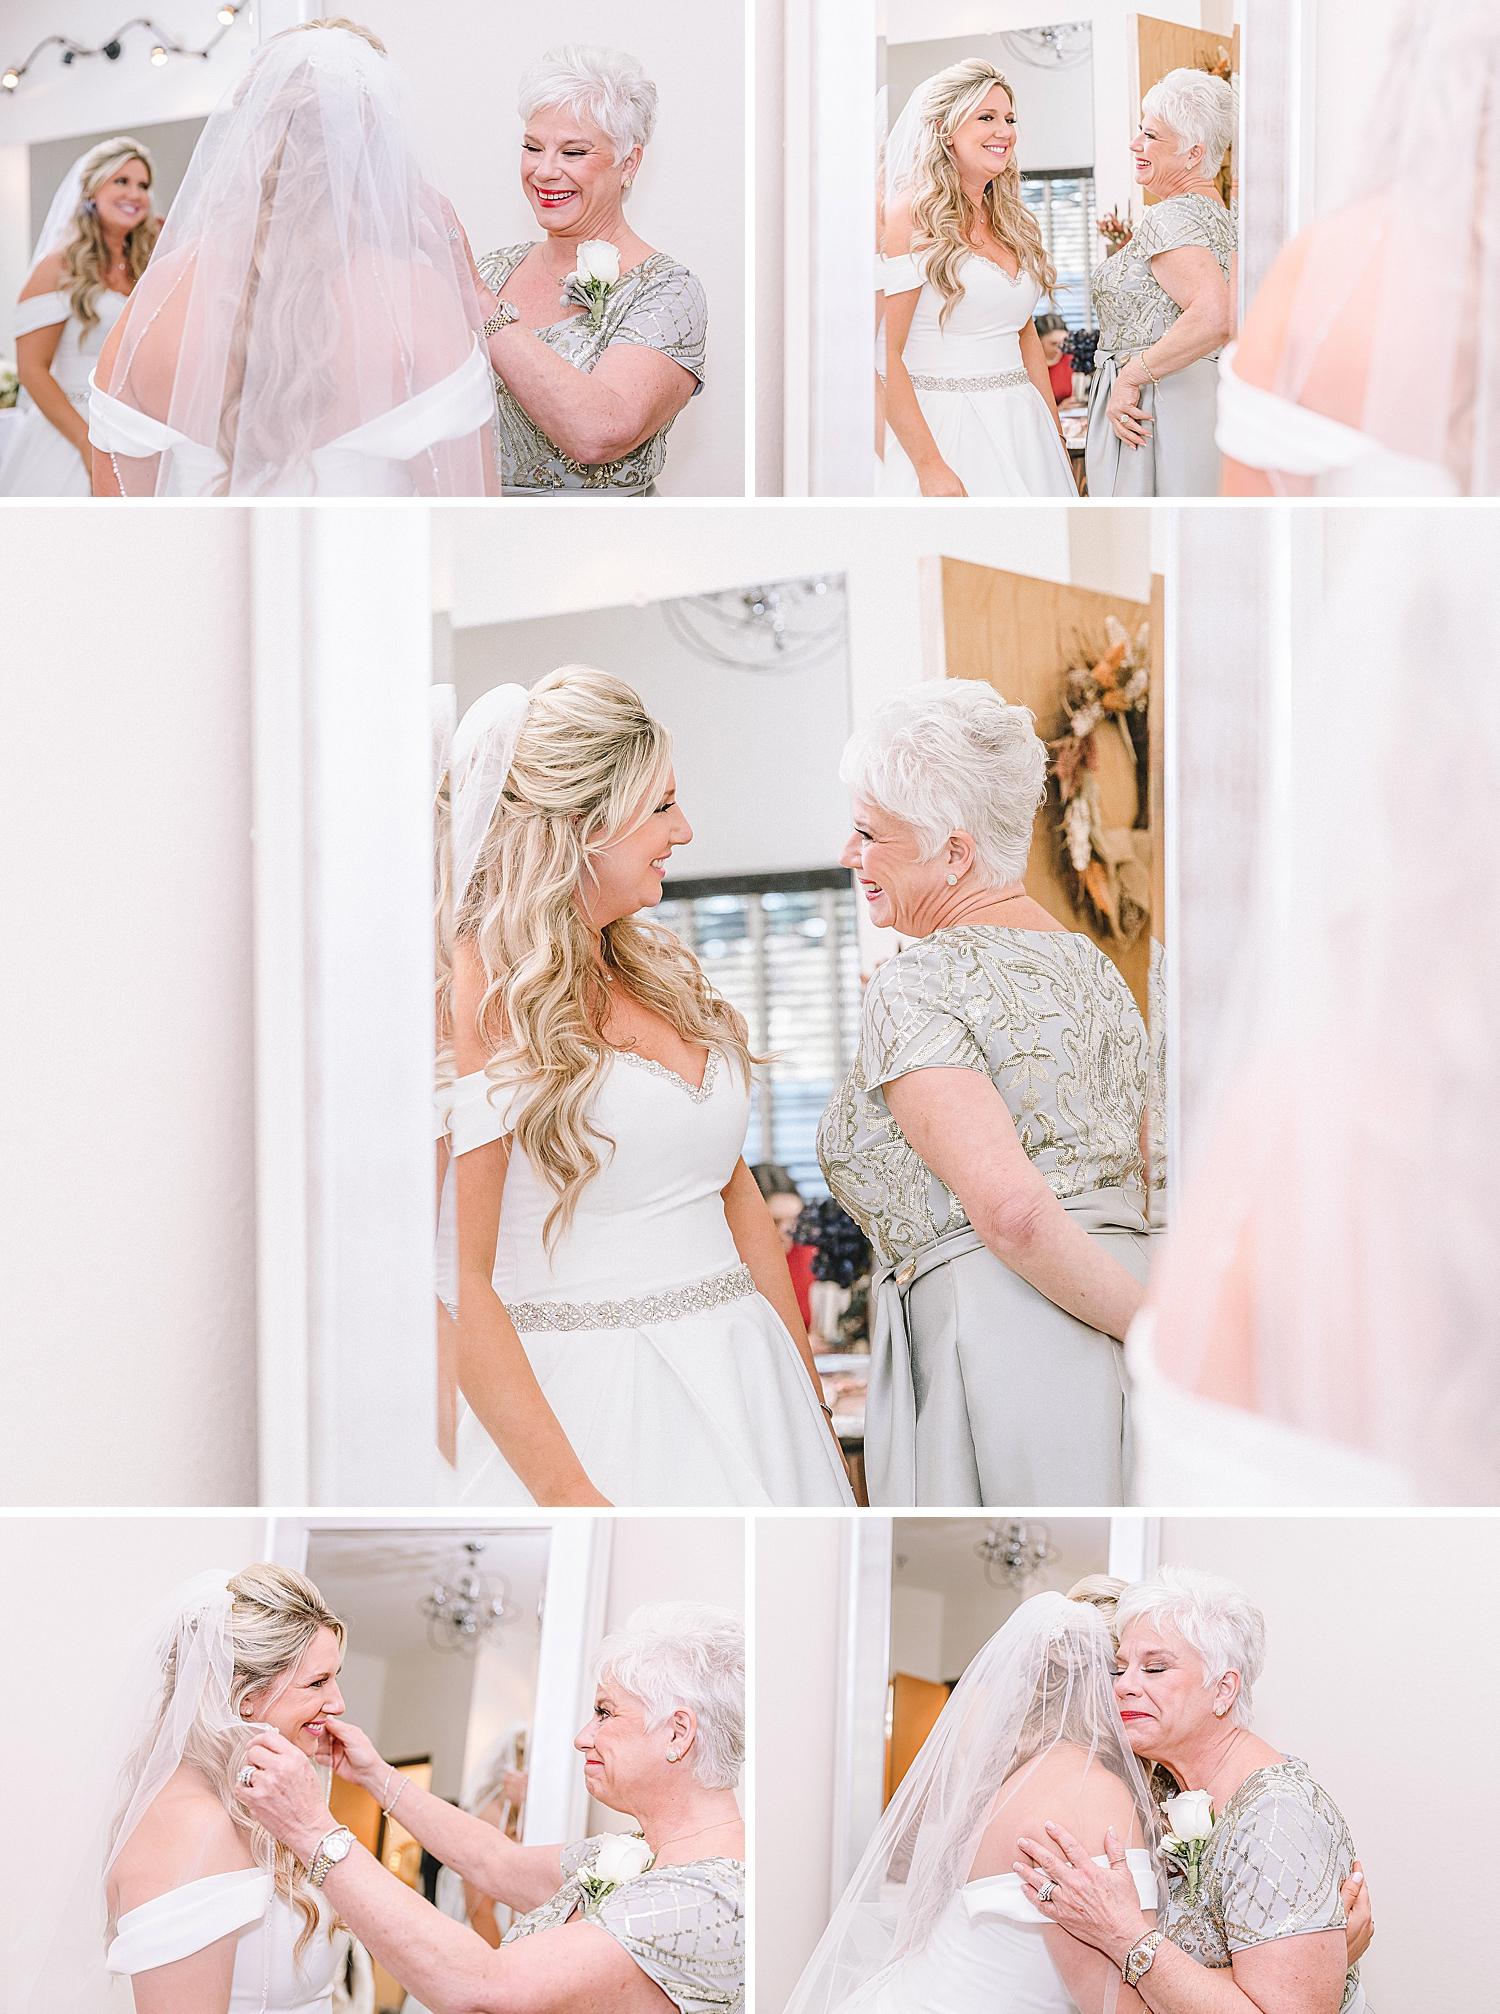 Magnolia-Halle-Wedding-San-Antonio-Texas-Bride-Grom_0011.jpg